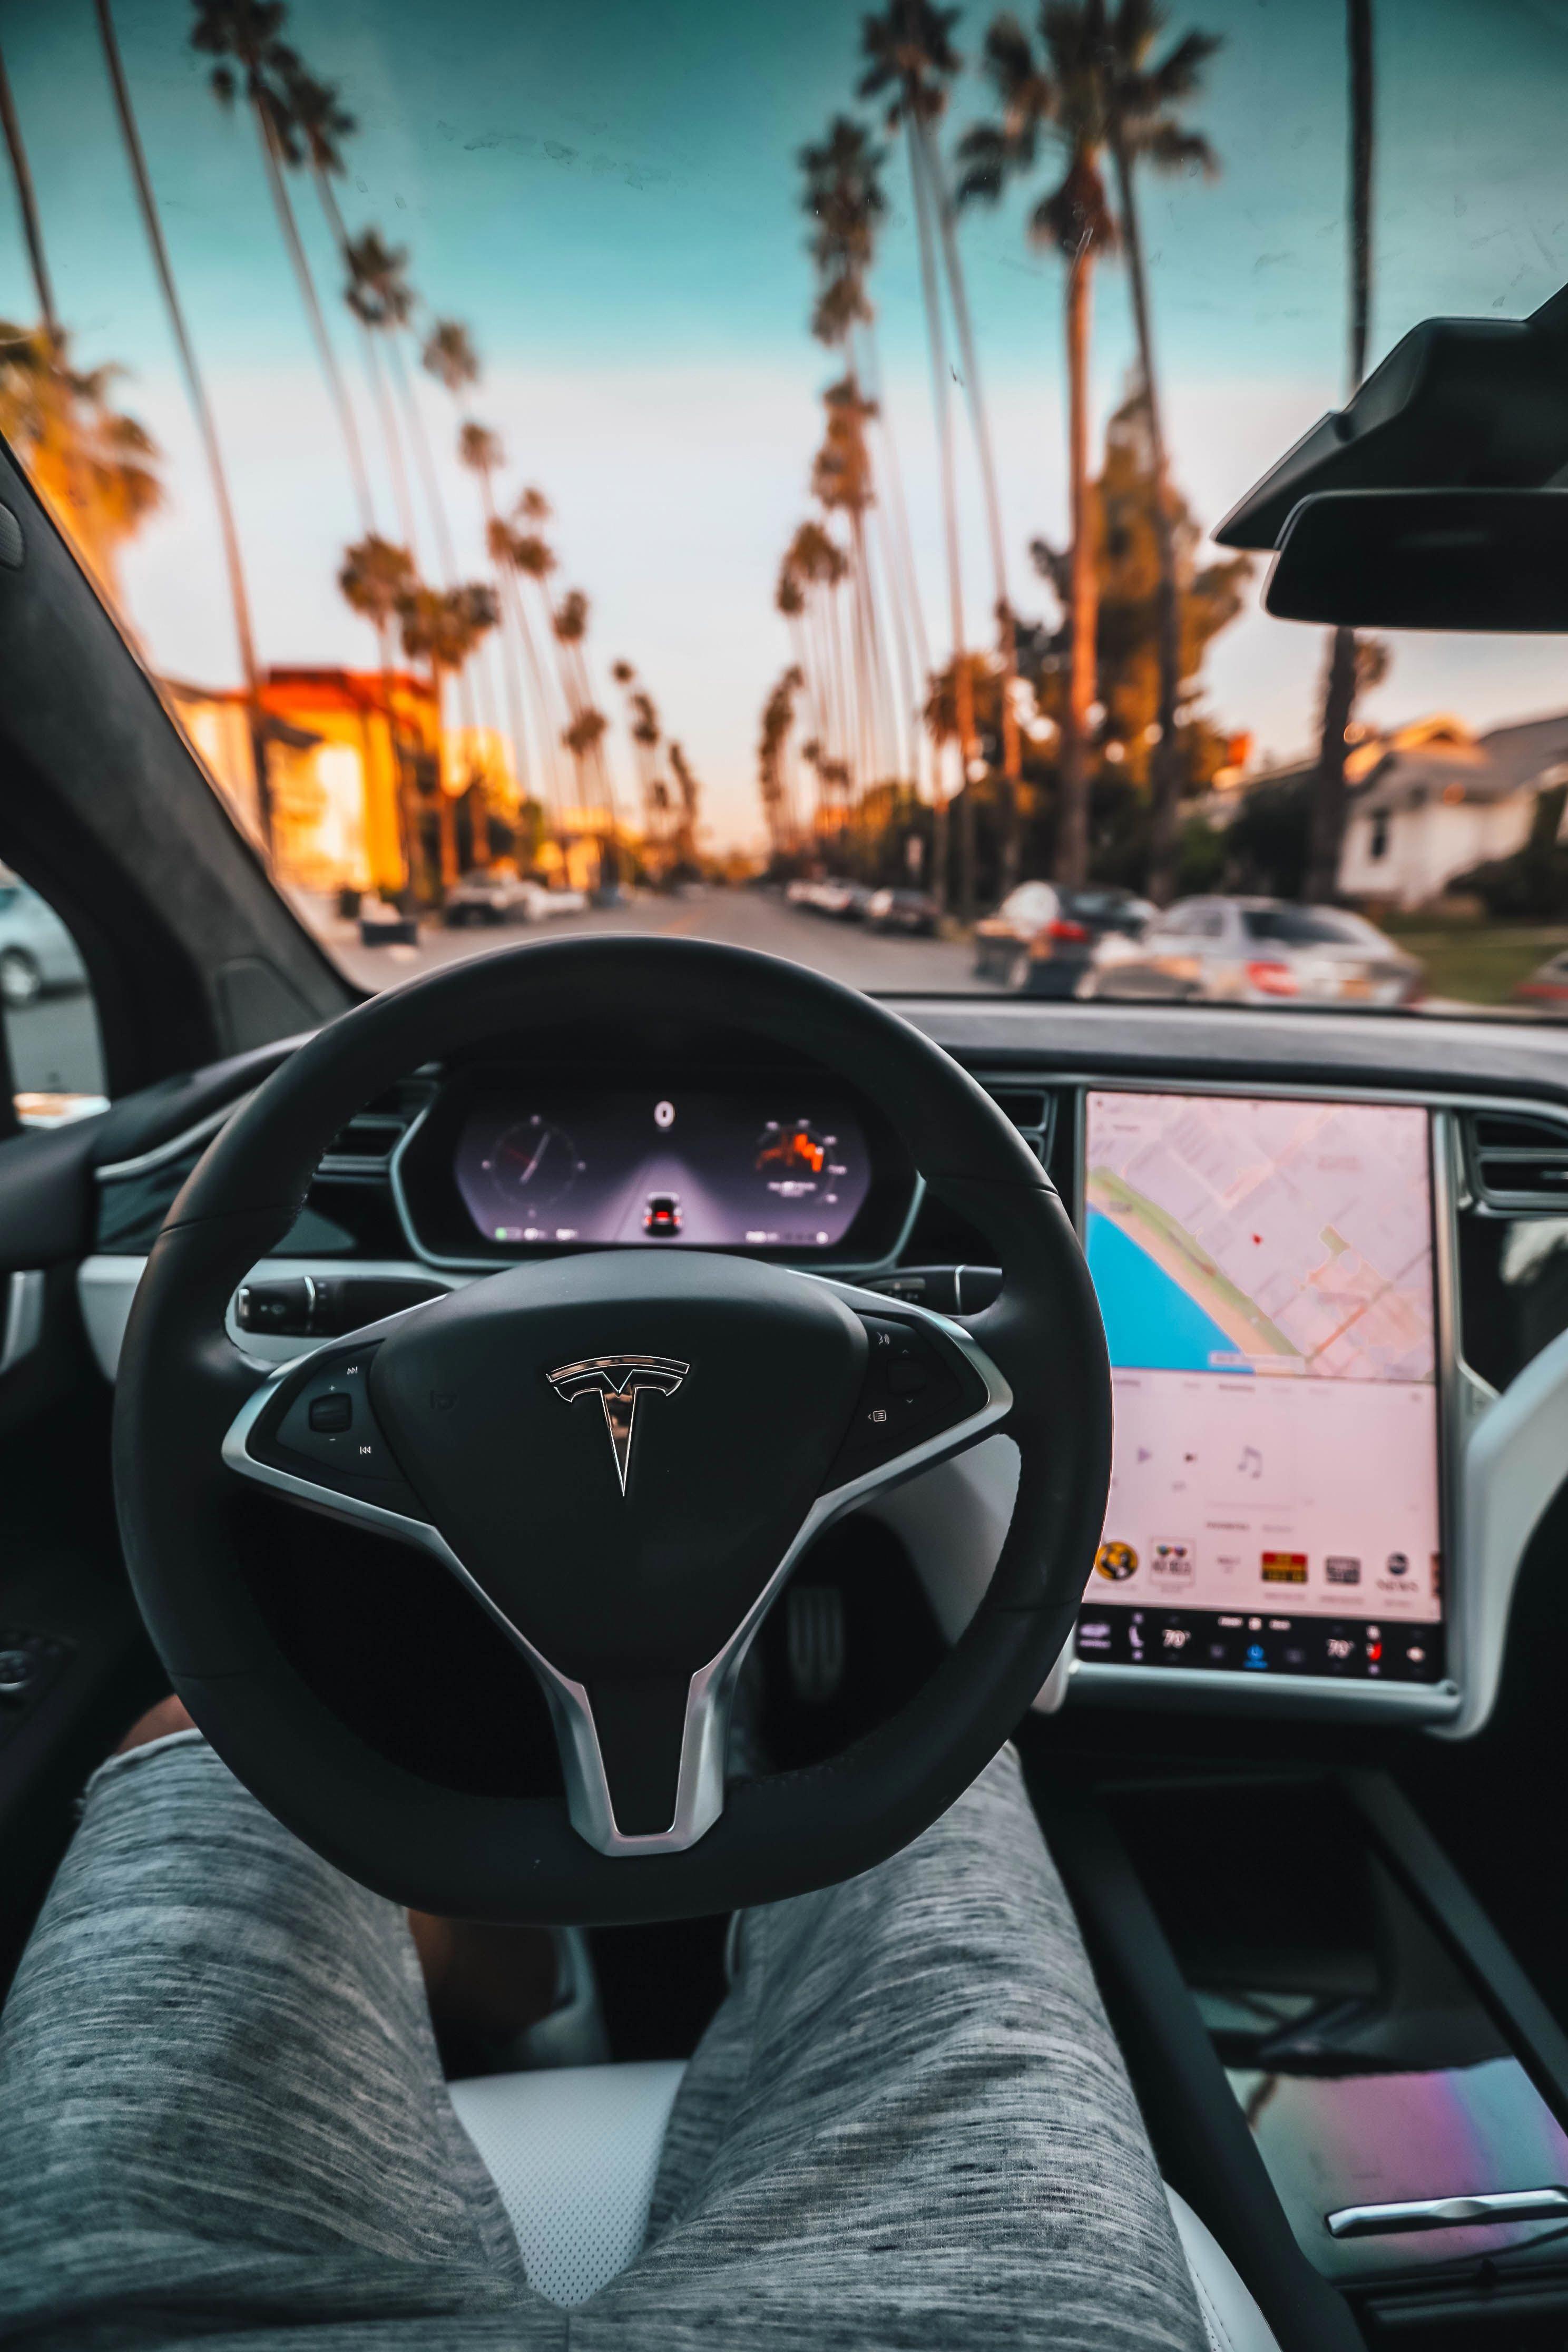 Tesla P100D Cockpit Tesla car Fantasticelectronicsworld